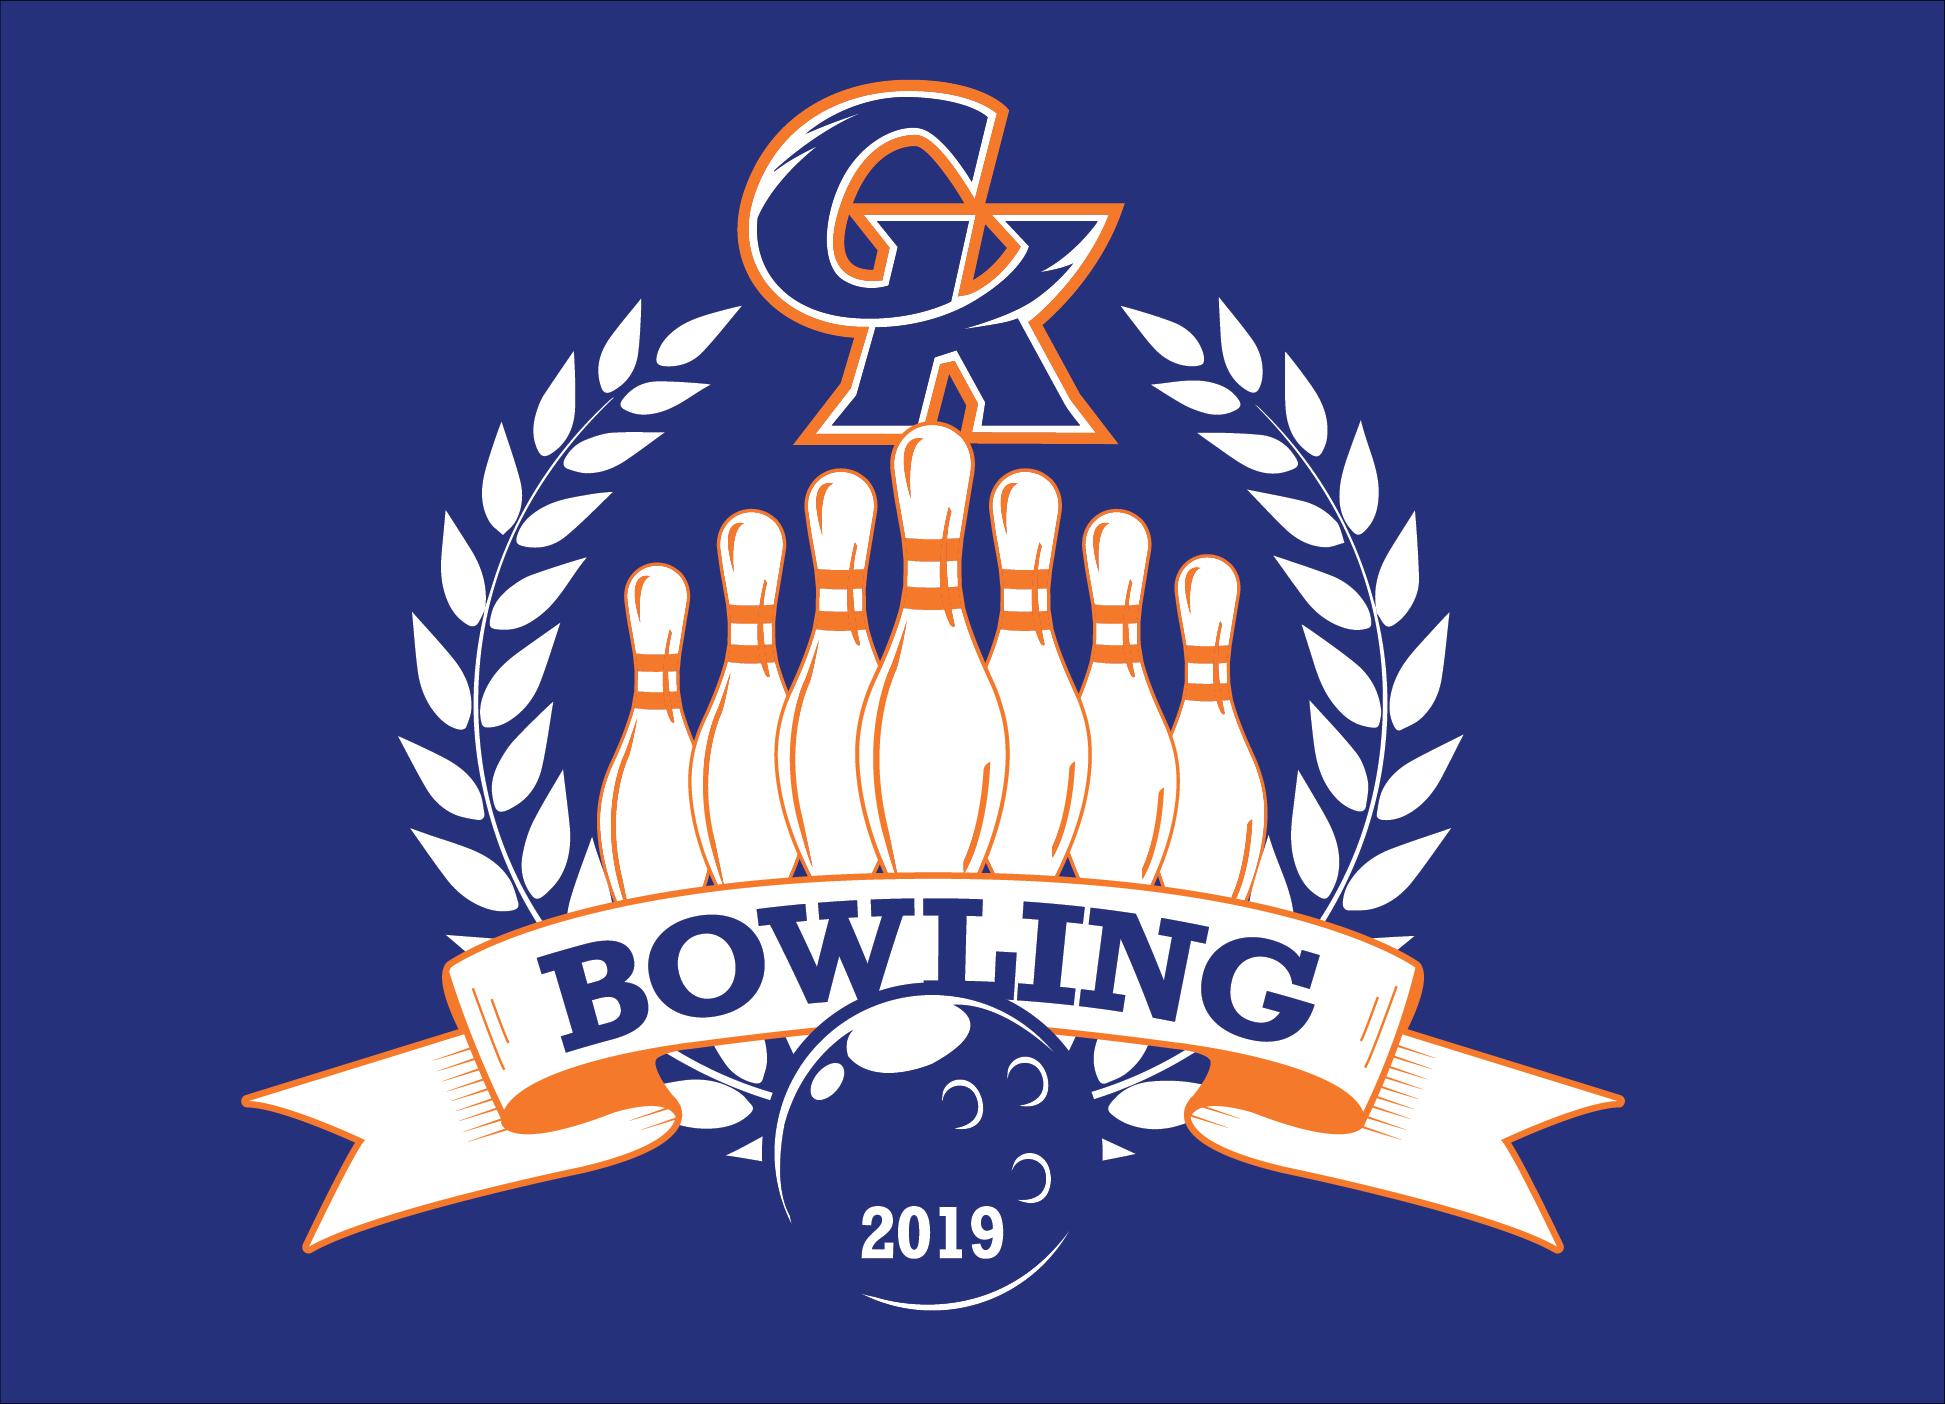 gk-bowling-19-02-.png